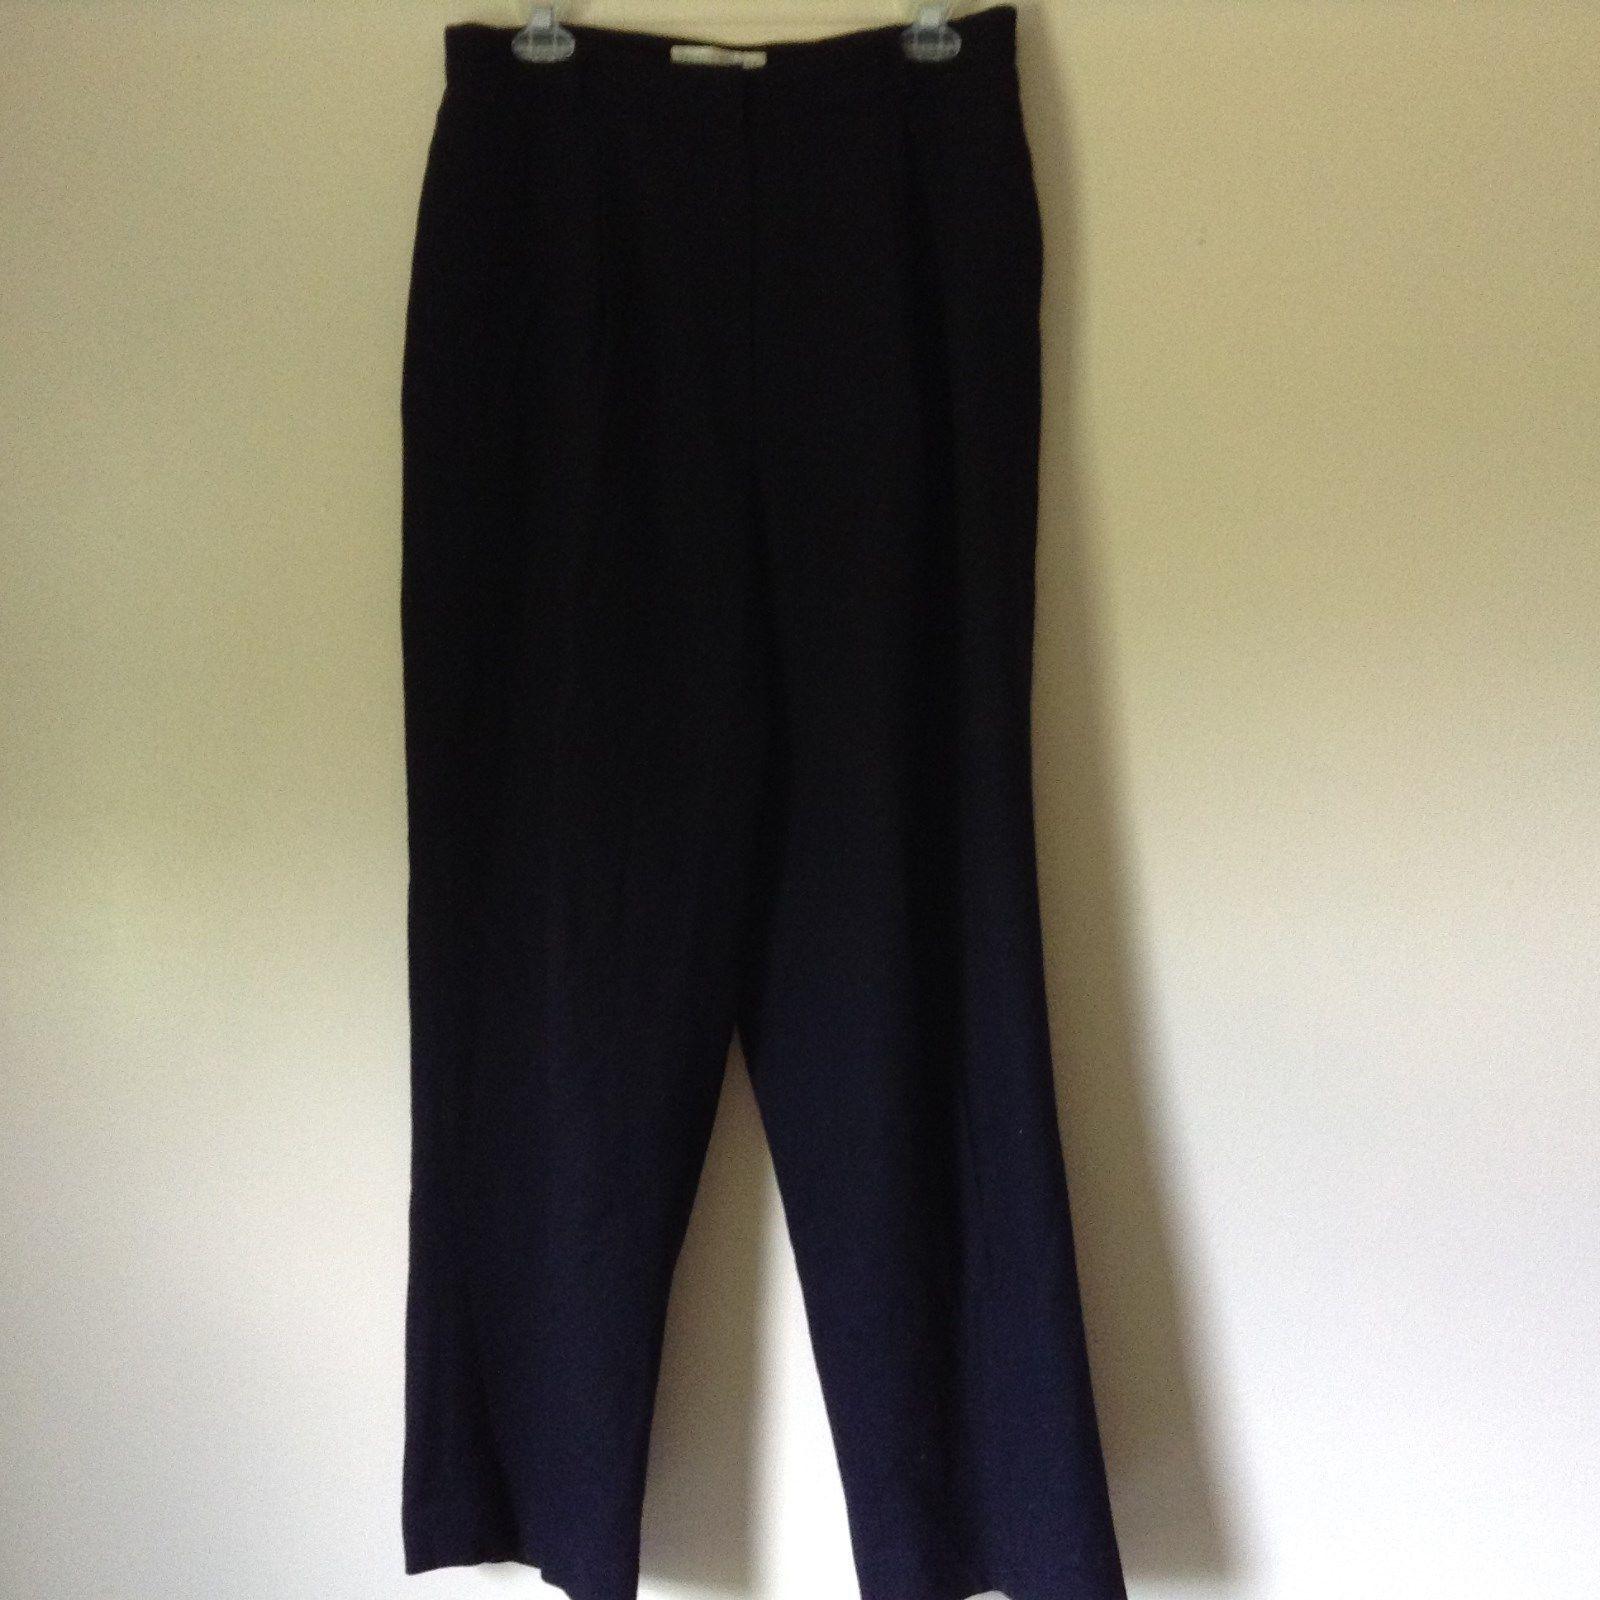 Valerie Stevens Pure Wool Dark Blue Dress Pants Size 14 Zipper Clasp Closure